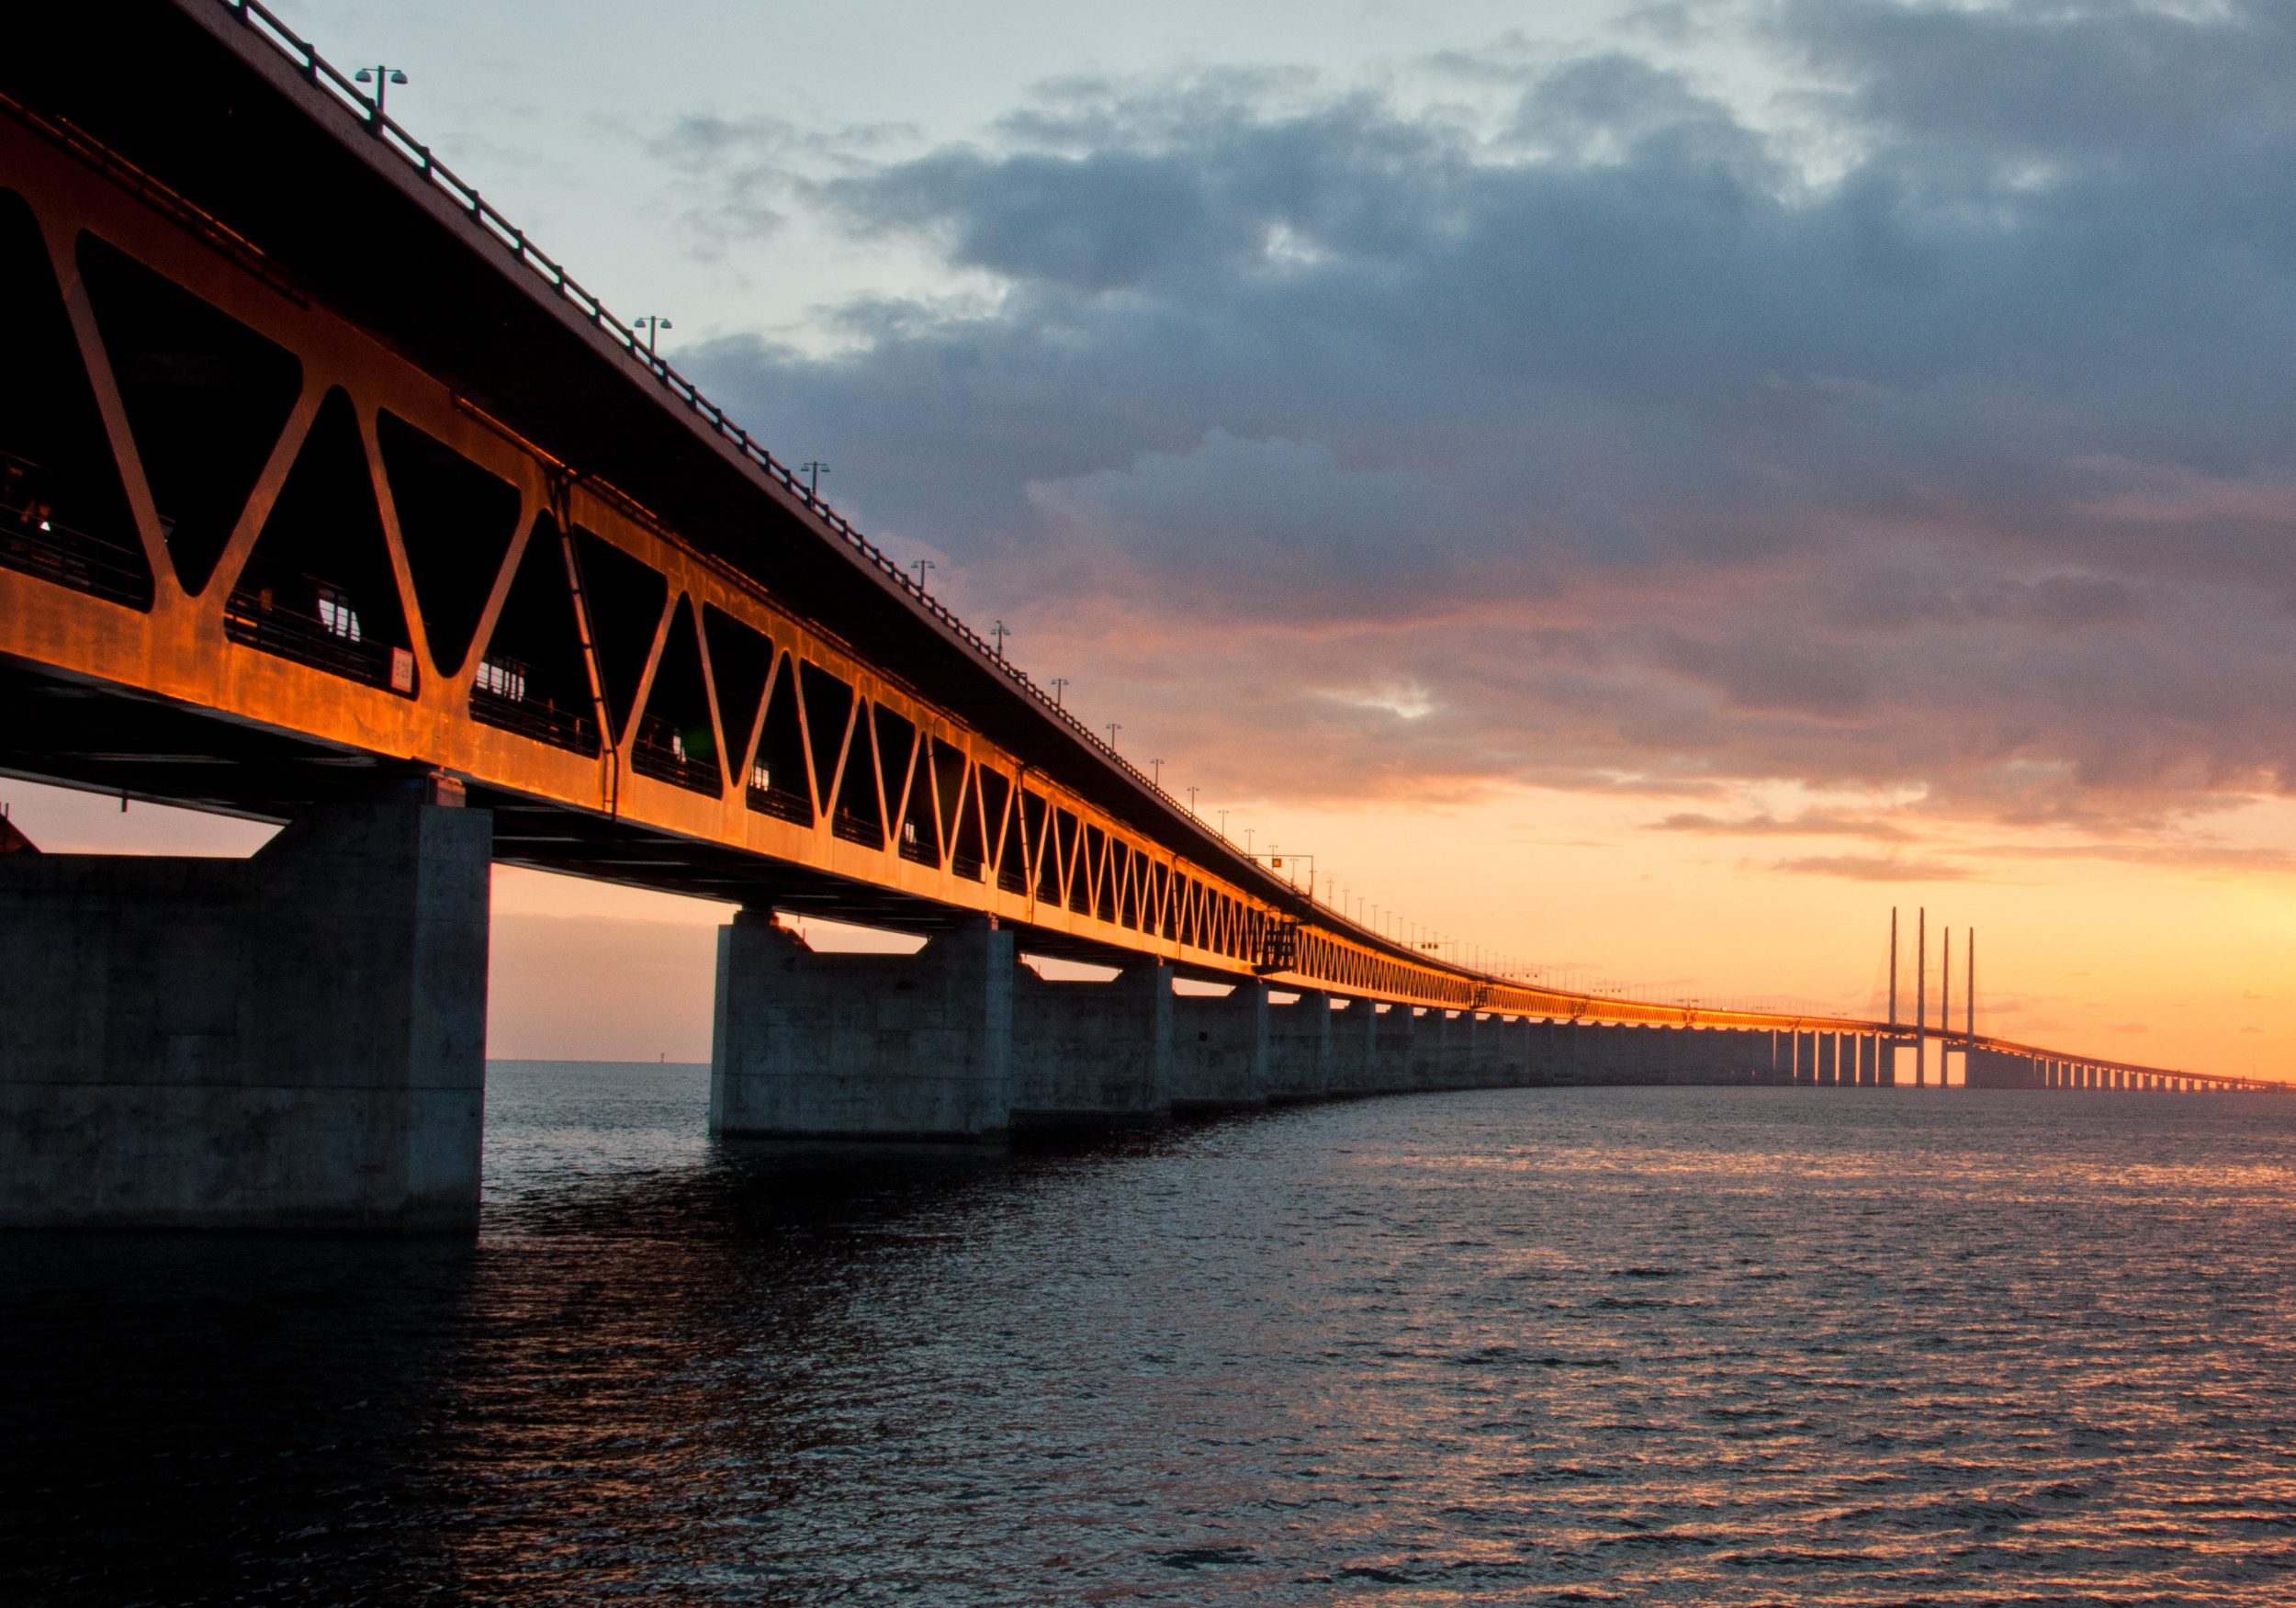 The stunning Øresund Bridge connects Copenhagen, Denmark with Malmo, Sweden. Image credit:    L.E Daniel Larsson   /Flickr